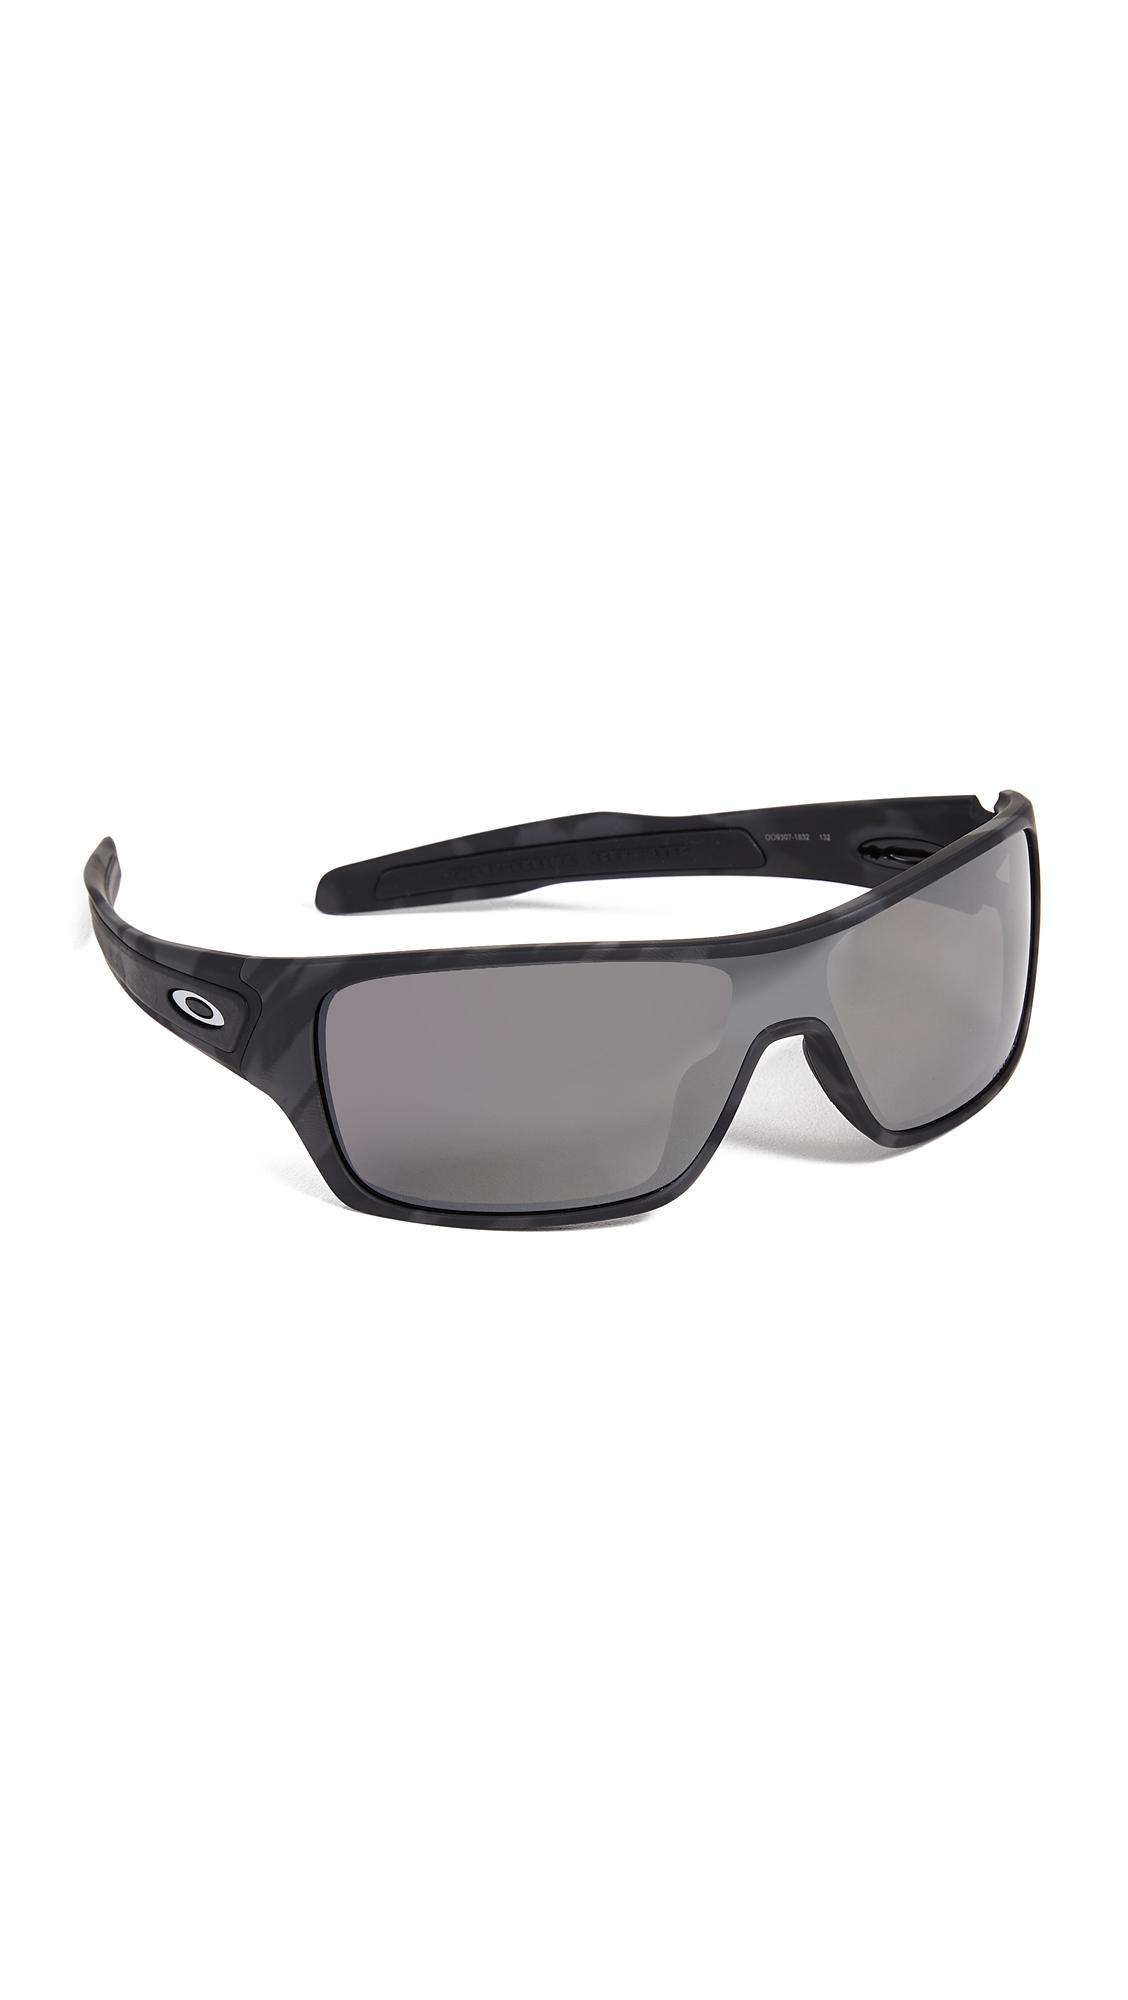 5923a6a187 Oakley Turbine Rotor Polarized Sunglasses in Black for Men - Lyst